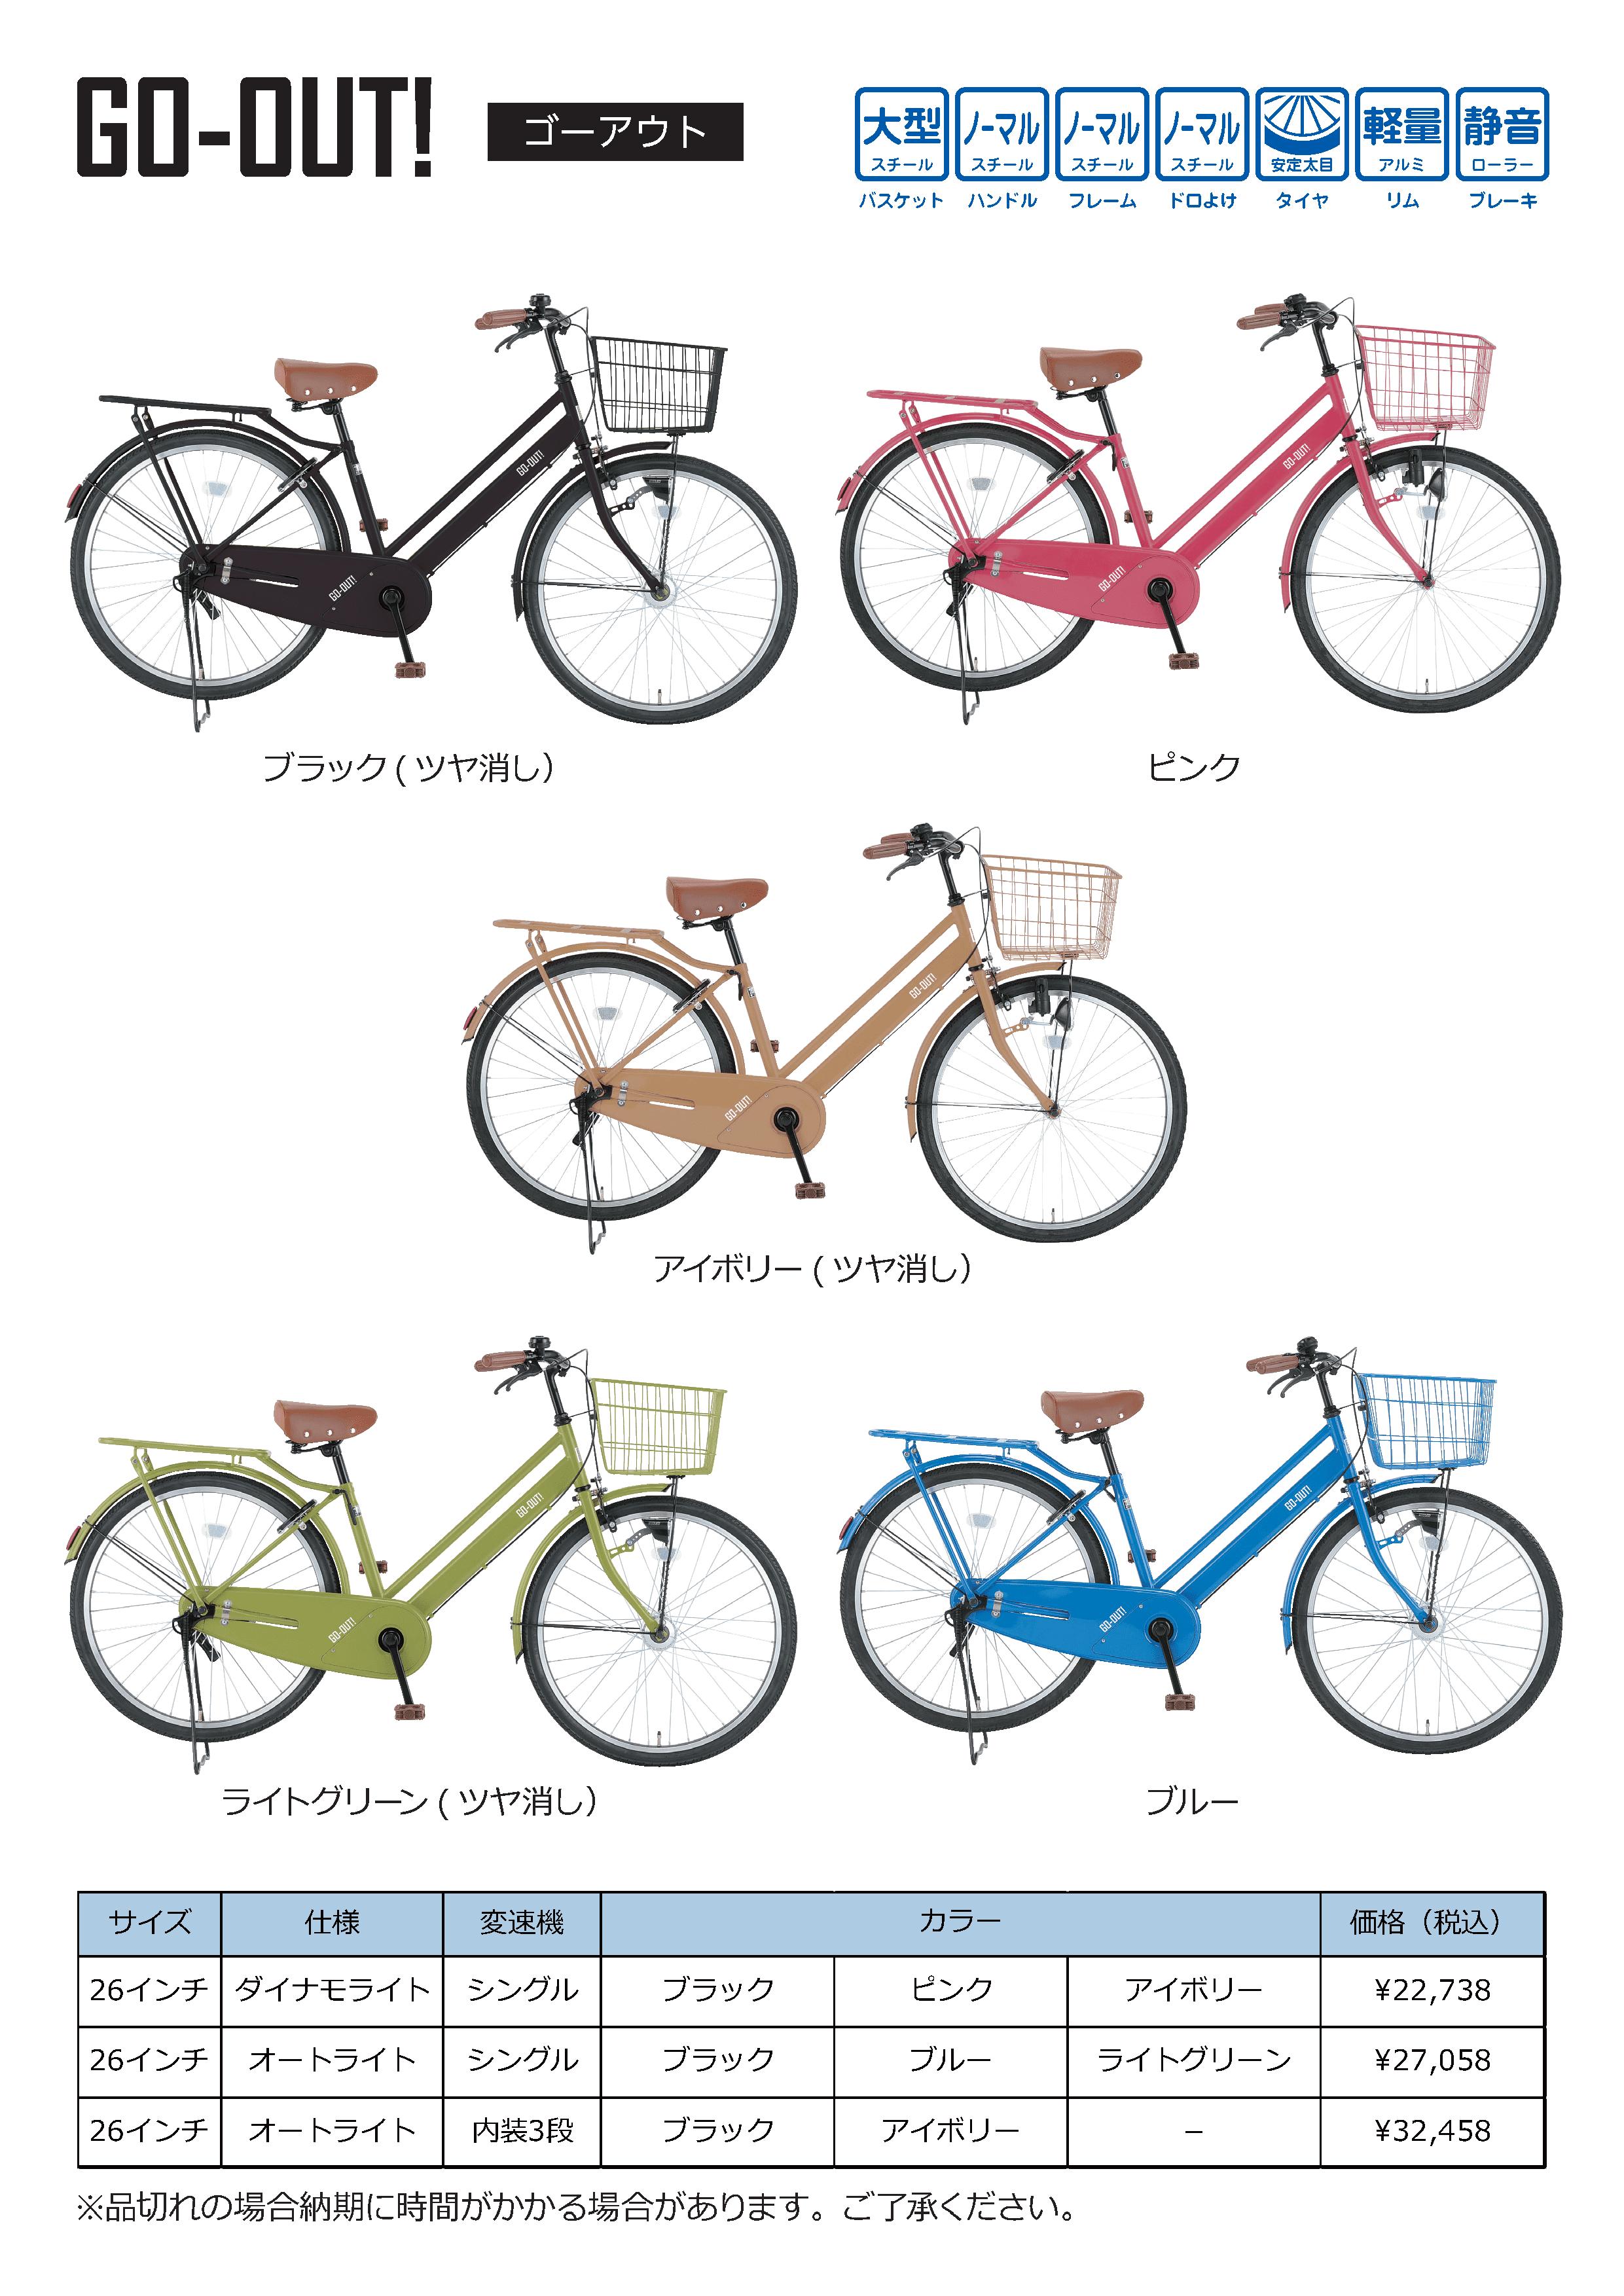 https://text.univ.coop/puk/START/tsuda/nus/webapp/data_images/html_images/3_goout-color(2).png